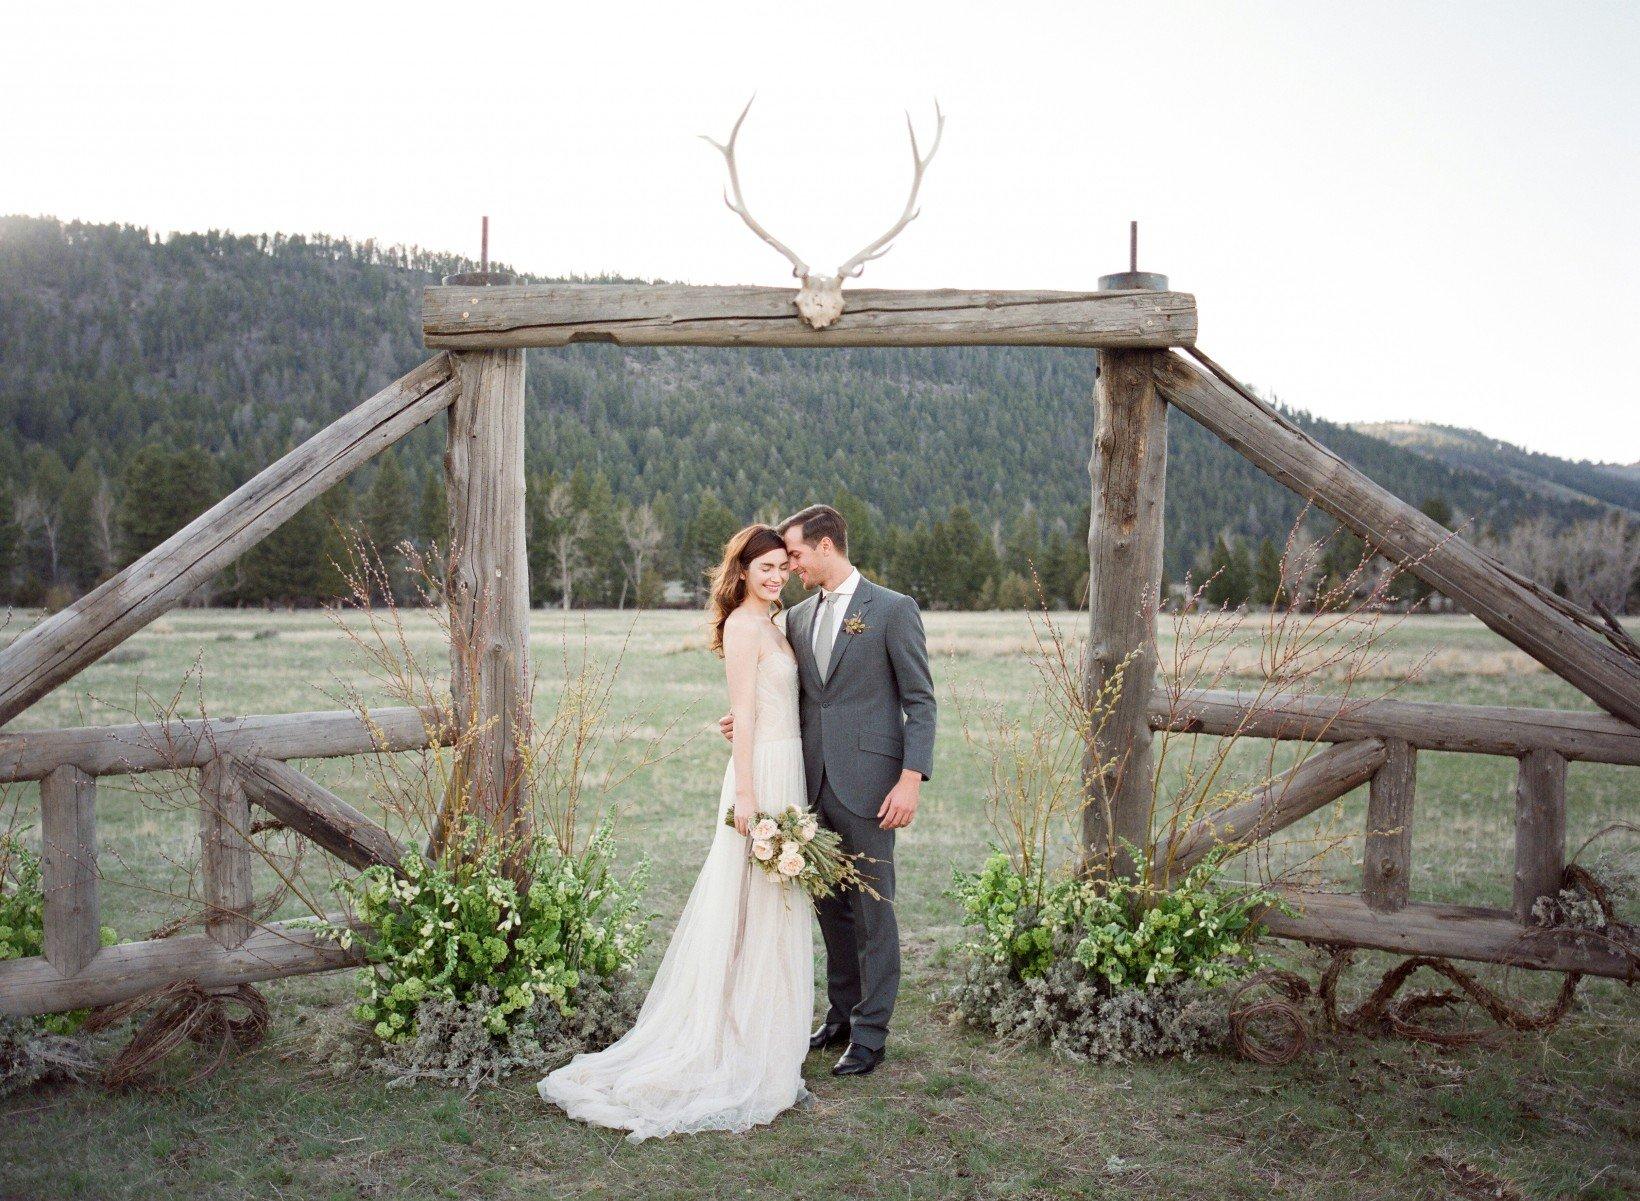 Jose Villa captures a beautiful wedding moment at The Ranch at Rock Creek in Montana